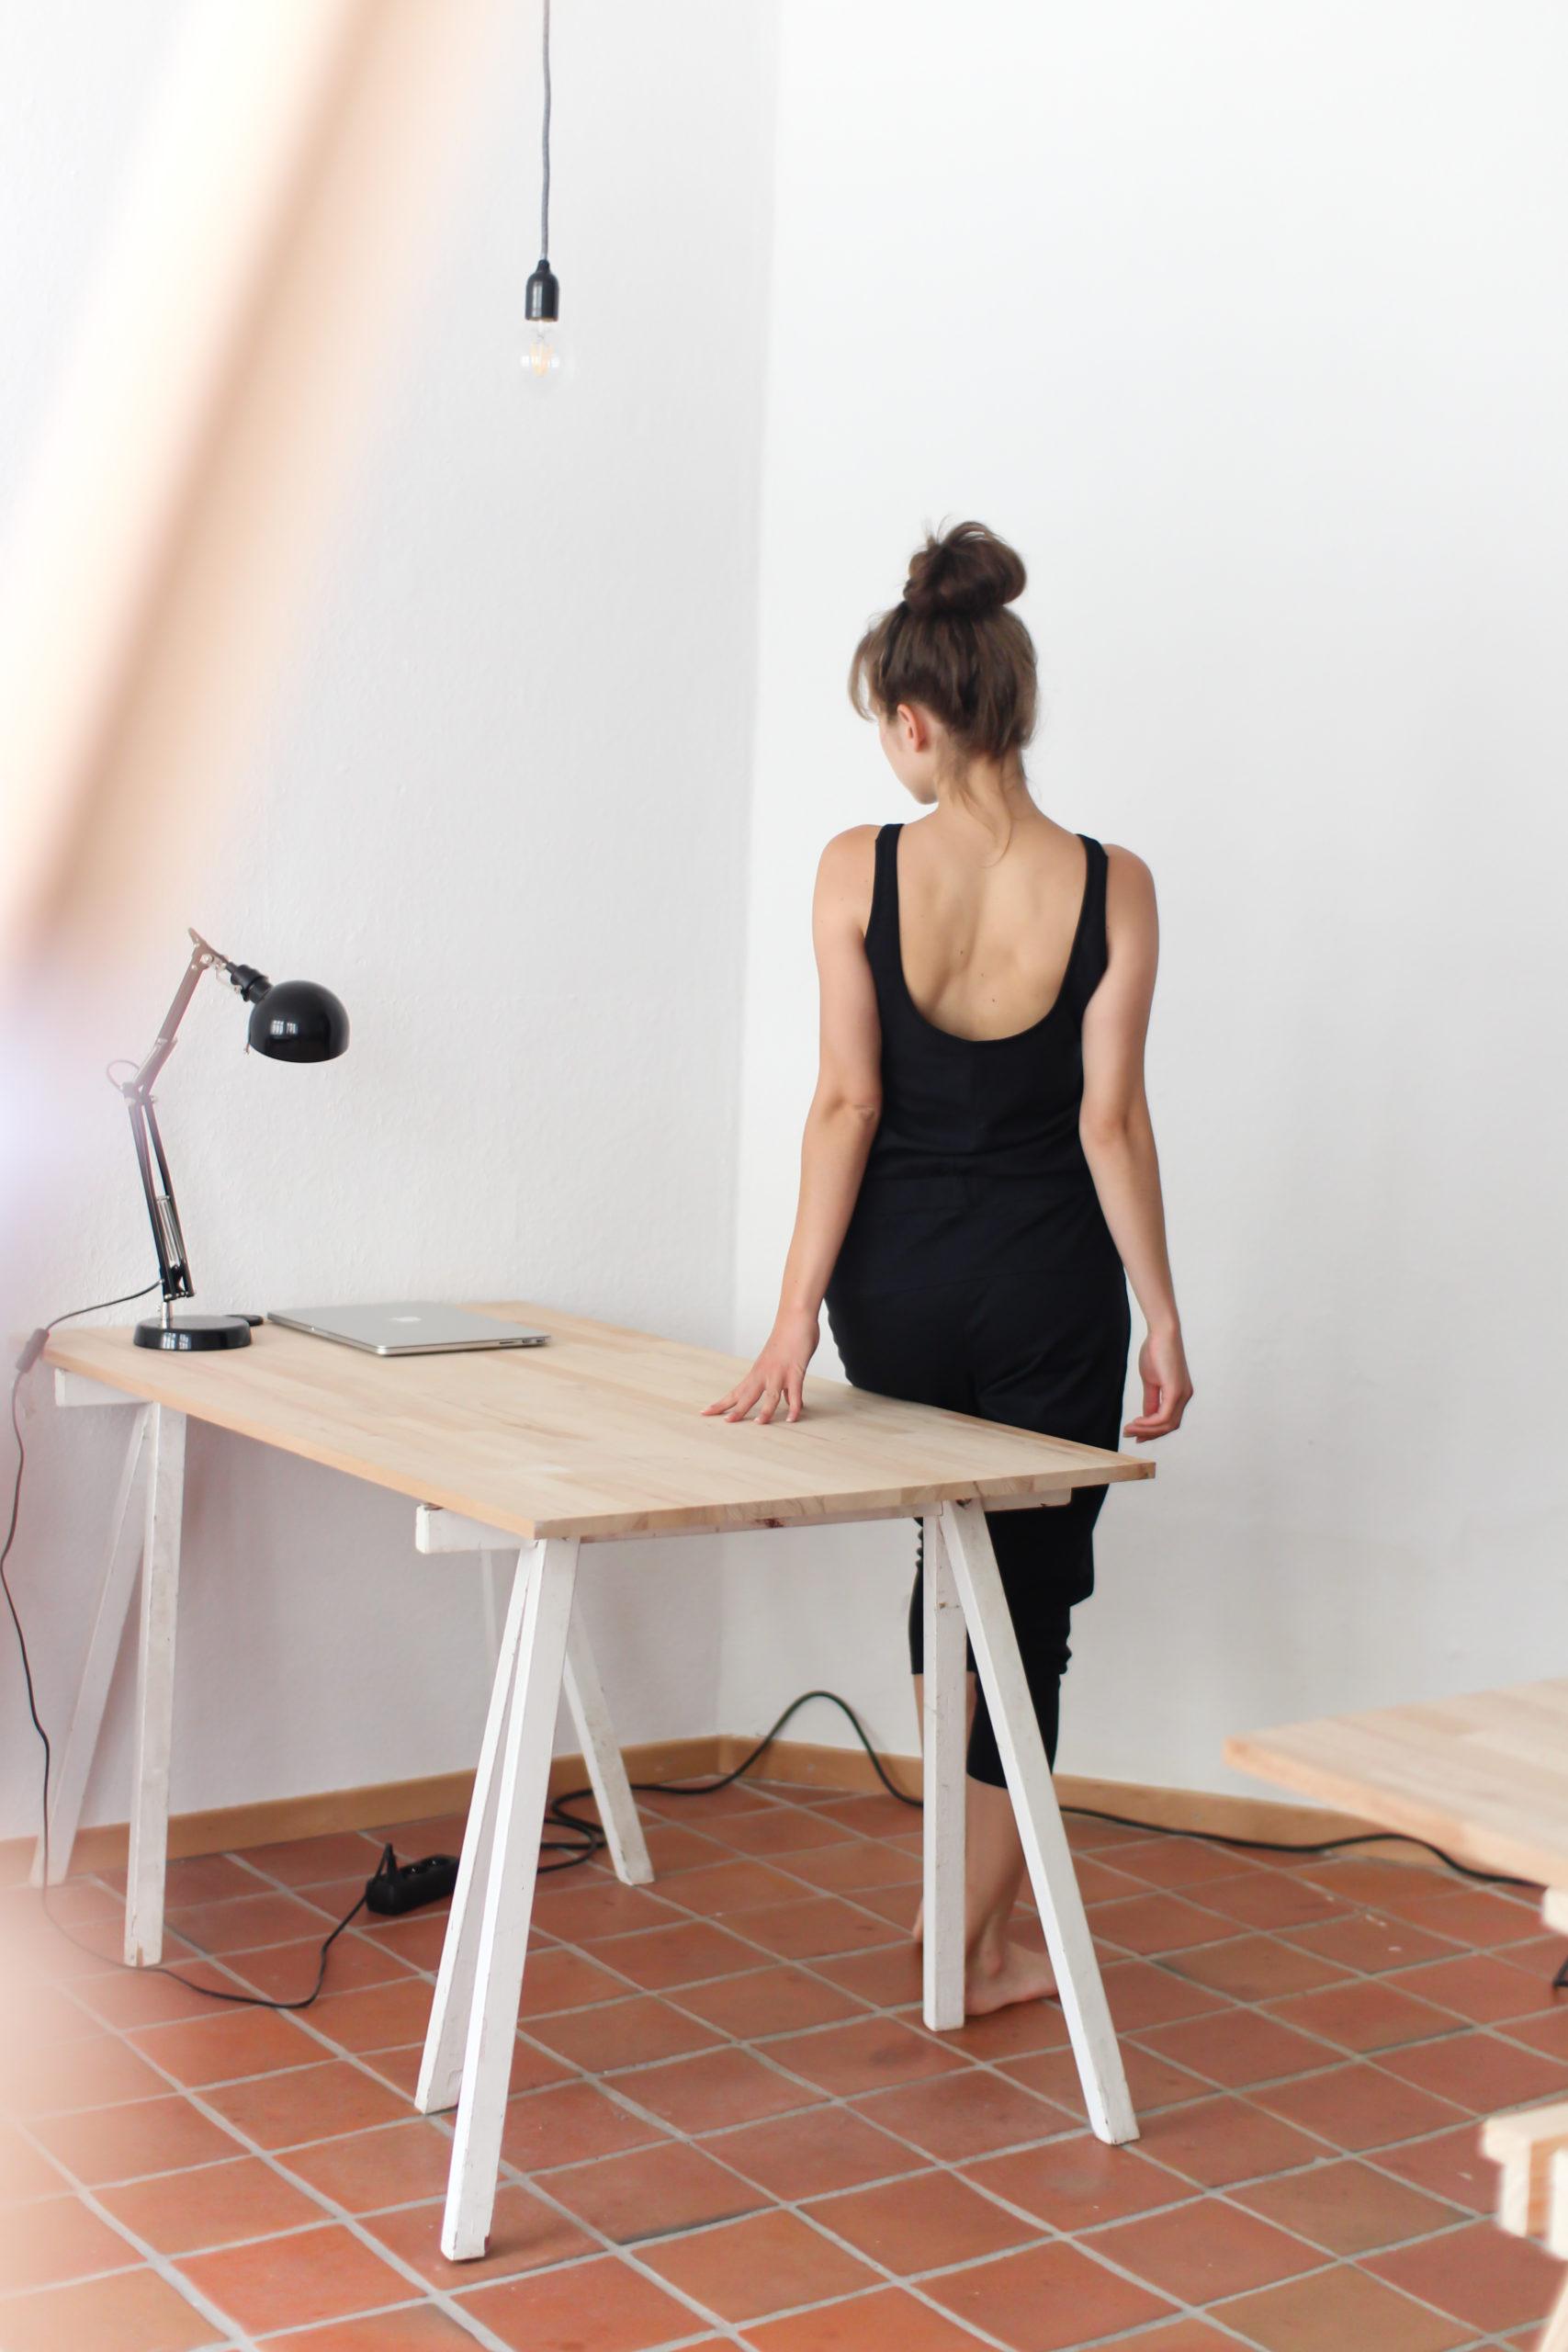 Fair Fashion Label Guide - Eco Yoga Wear